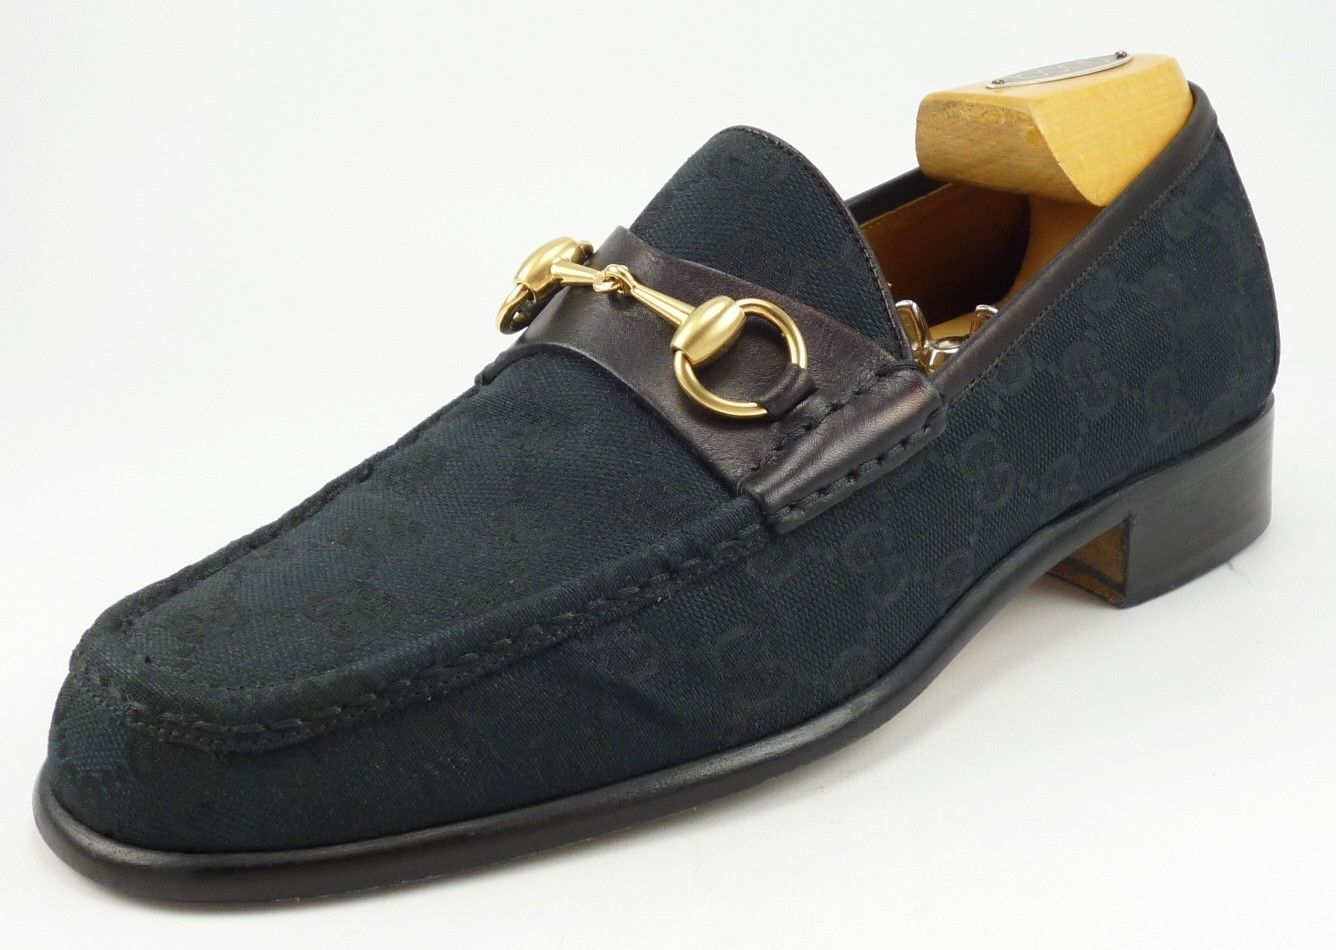 43afb4233f5 Gucci sz 7.5 GG Canvas Bit Loafers 015942 Mens Black fits US 7.5 ...